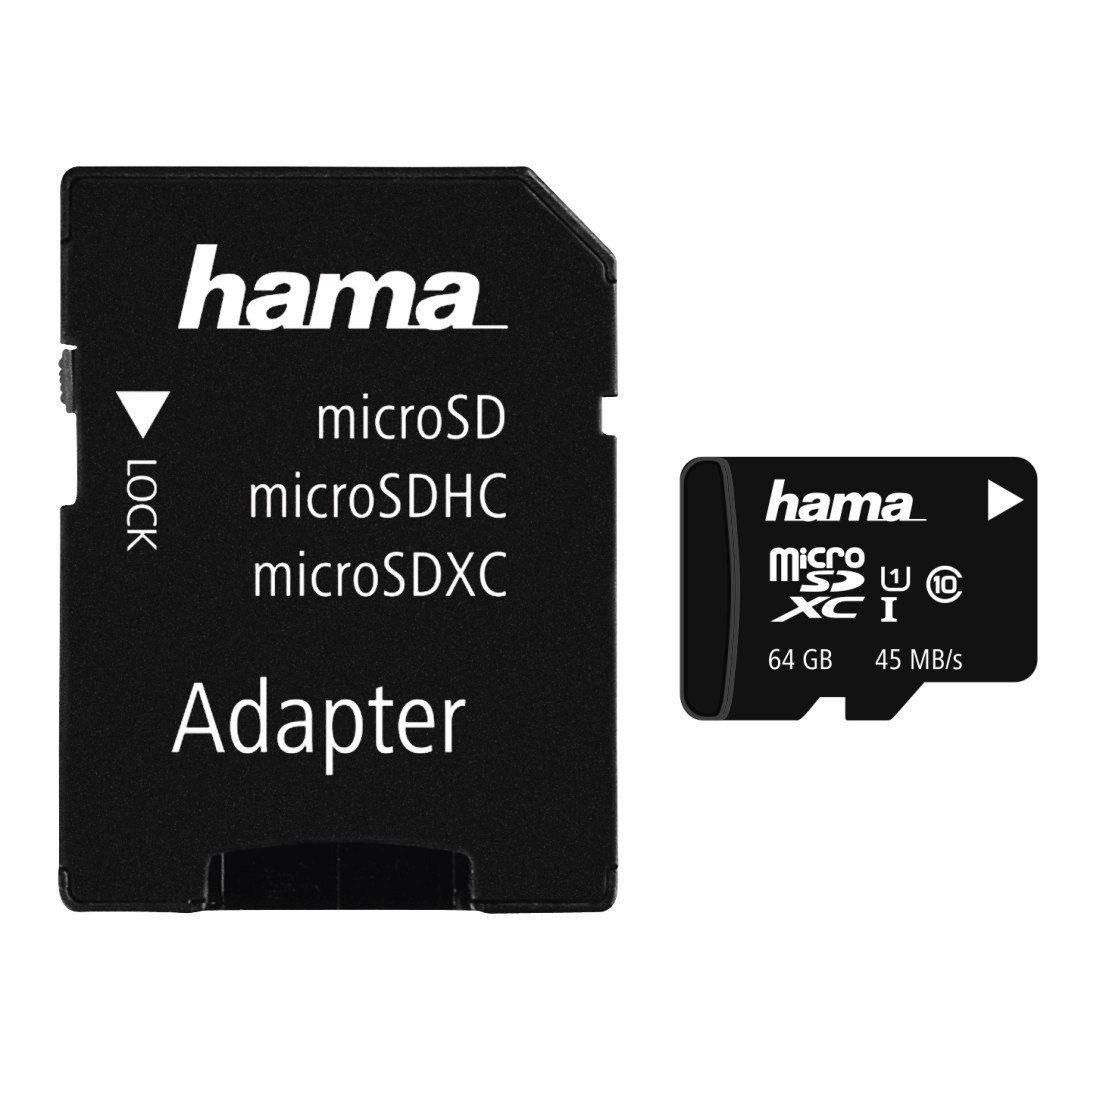 Hama Speicherkarte microSDXC 64GB, Class 10, UHS-I, 45MB/s »inkl. Adapter/Mobile«